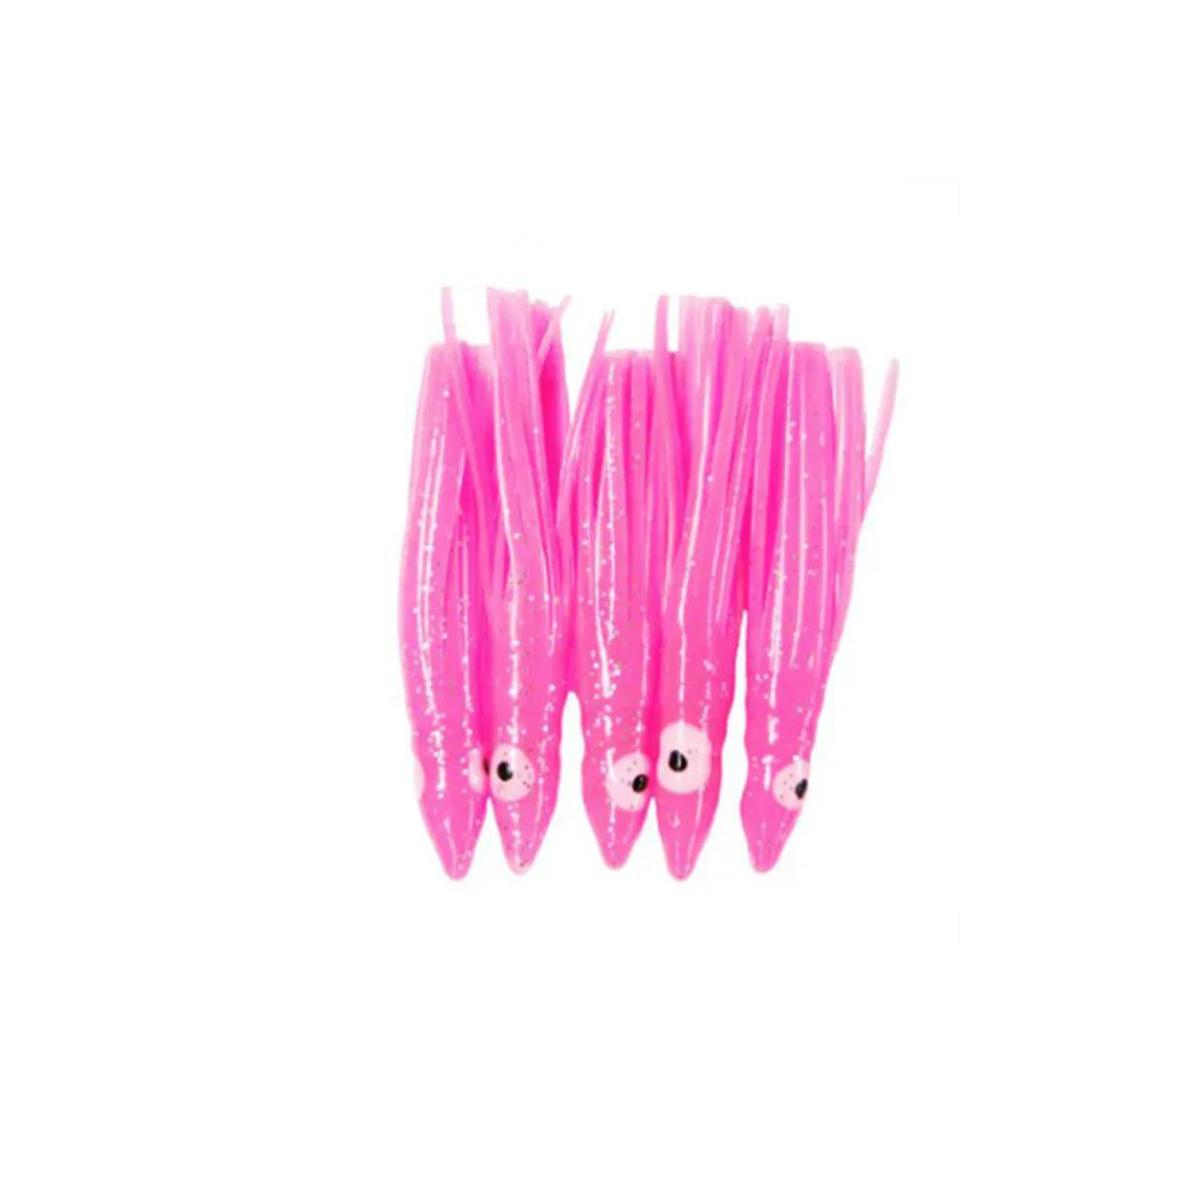 Kit 25 Lulinhas Kalmar 9 cm (Rosa)  - Pró Pesca Shop